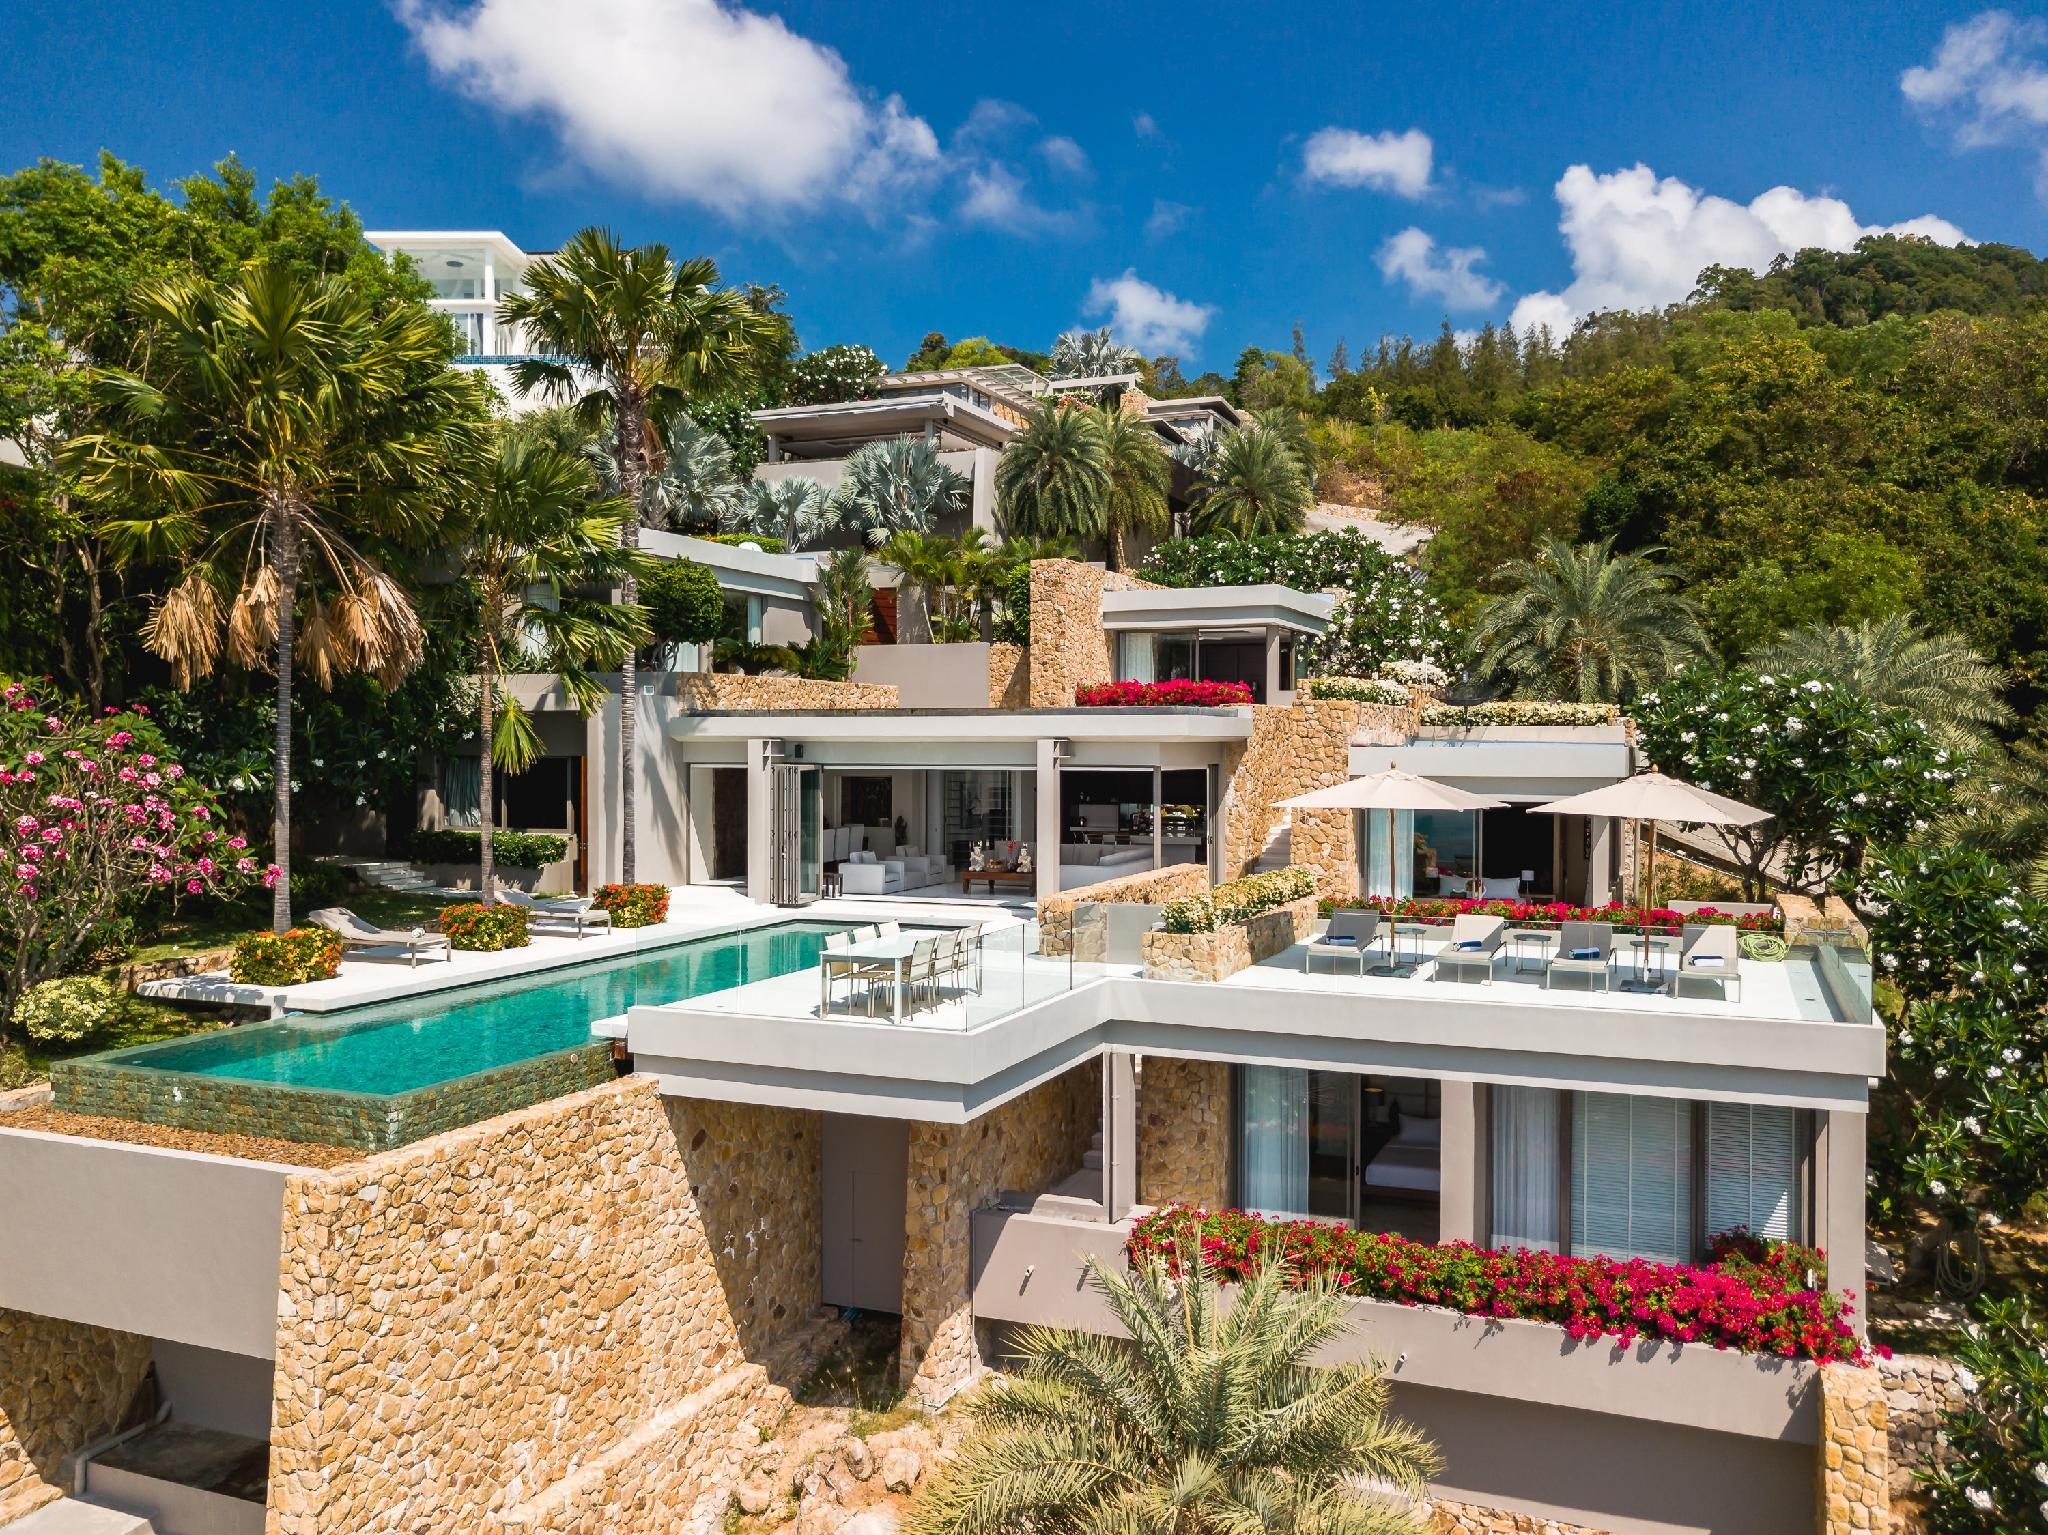 Villa Baan Serenity Luxurious Panoramic Sea View